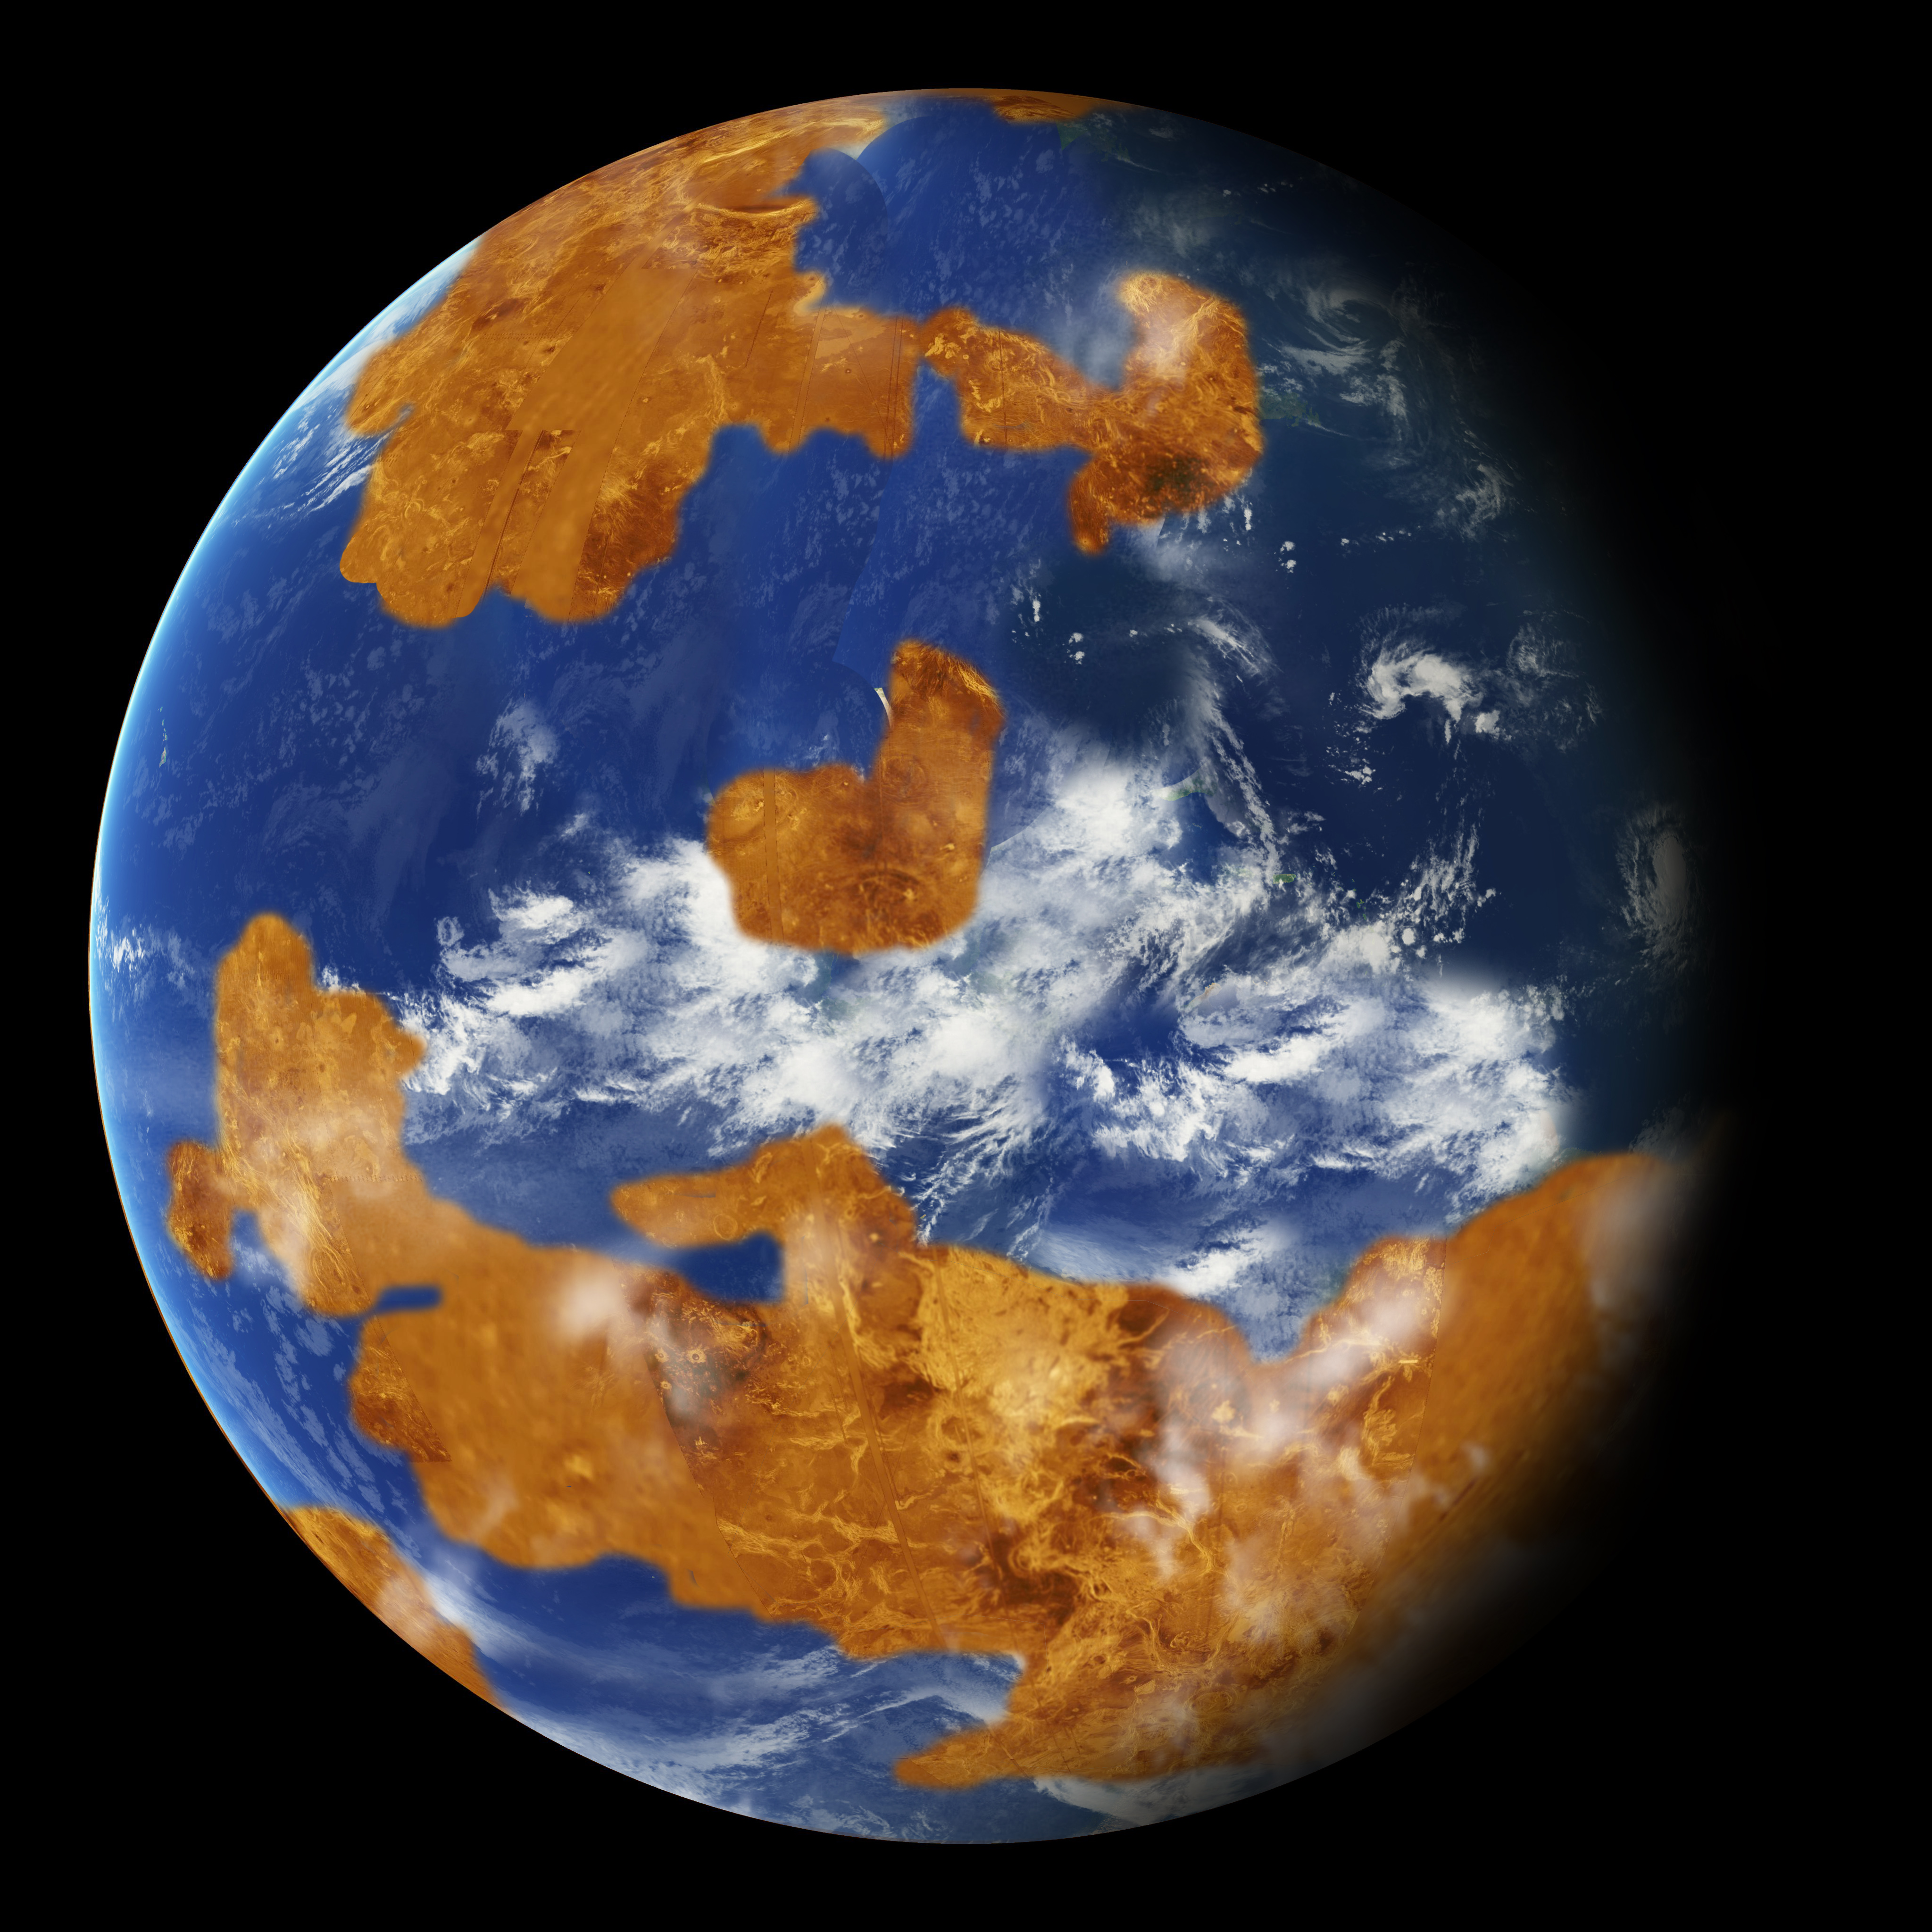 bbc horizon 2016 oceans of the solar system